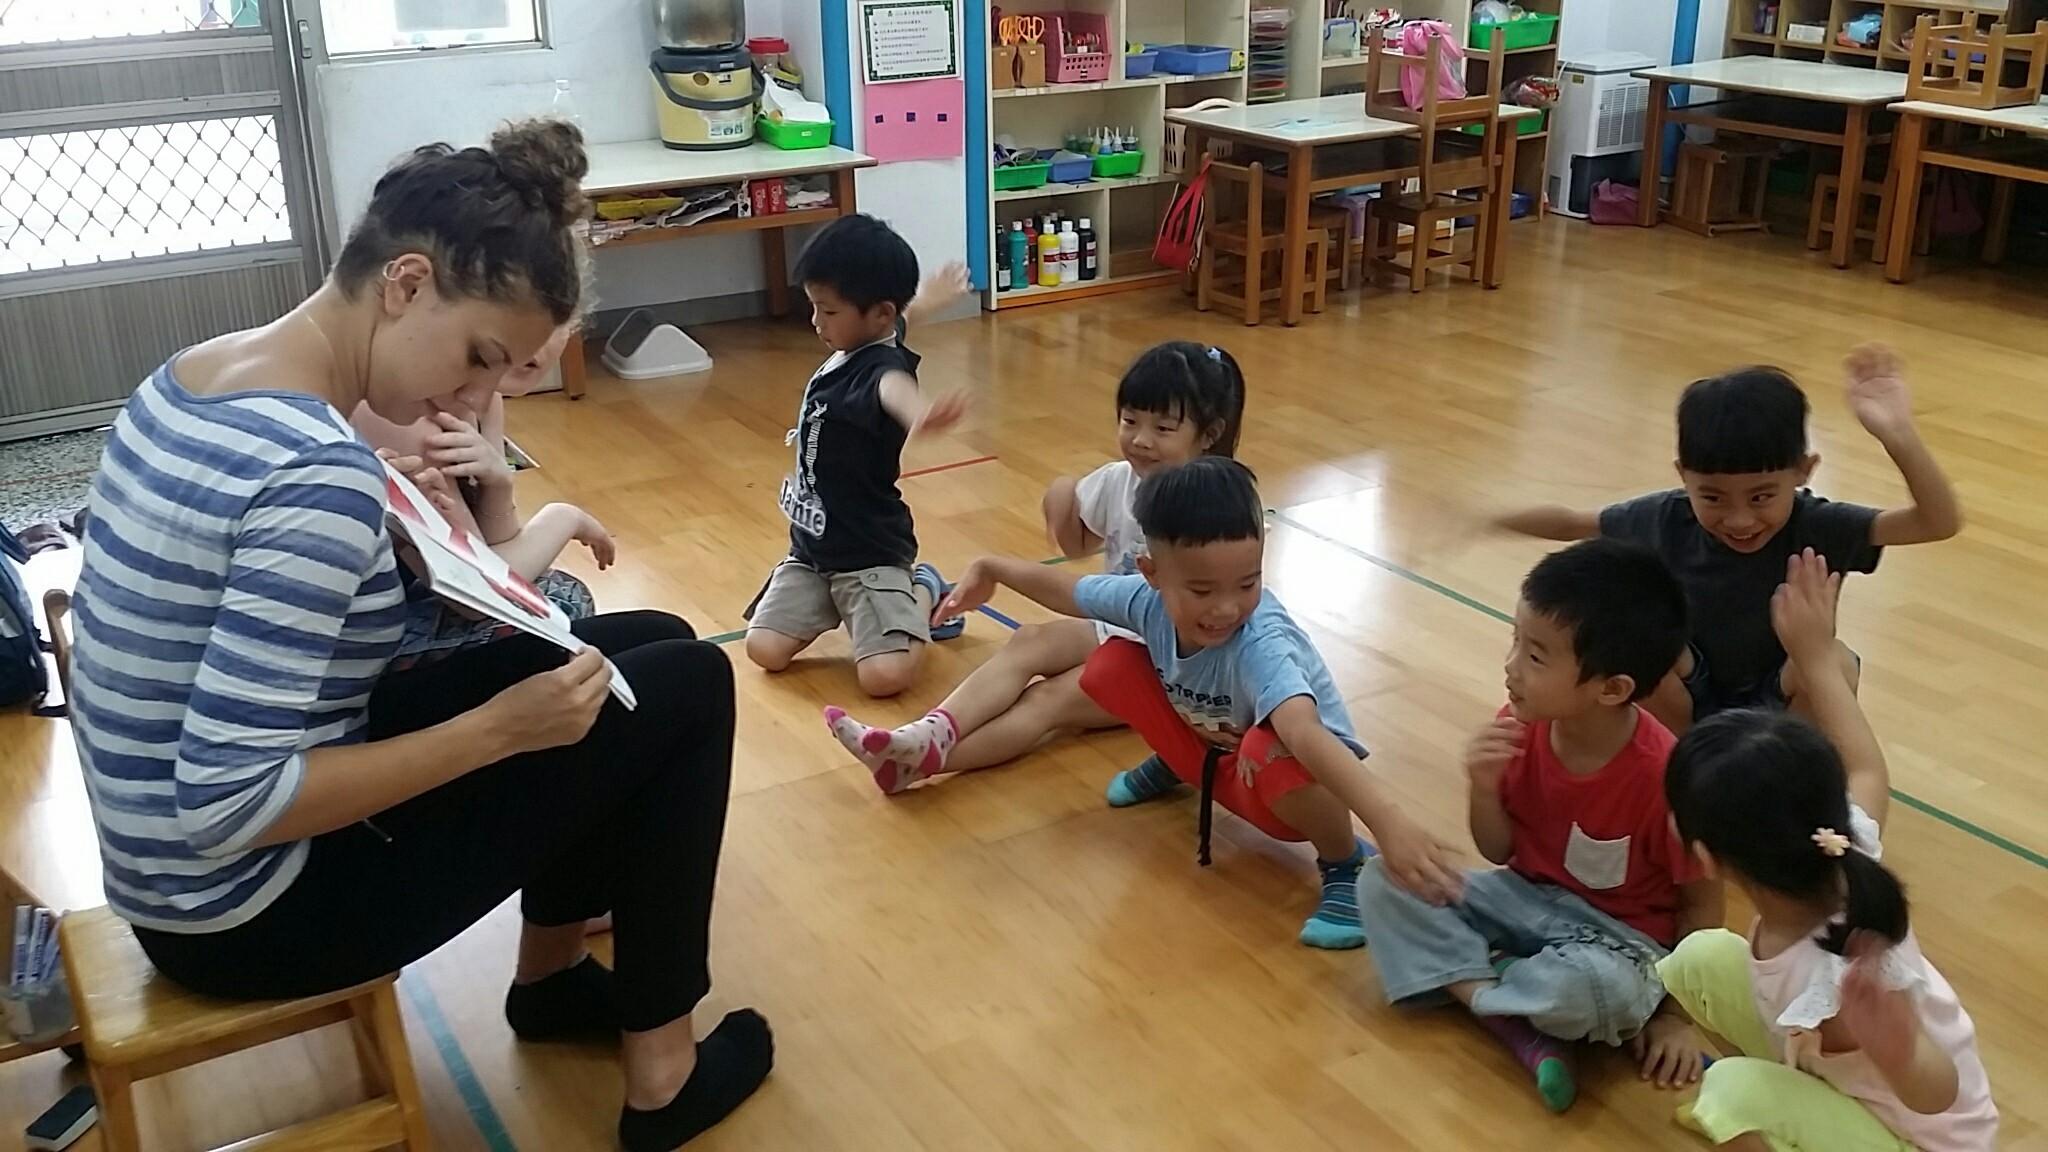 http://www.tses.cyc.edu.tw/uploads/tadgallery/2017_06_30/3848_國際志工幼兒園_170630_0008.jpg